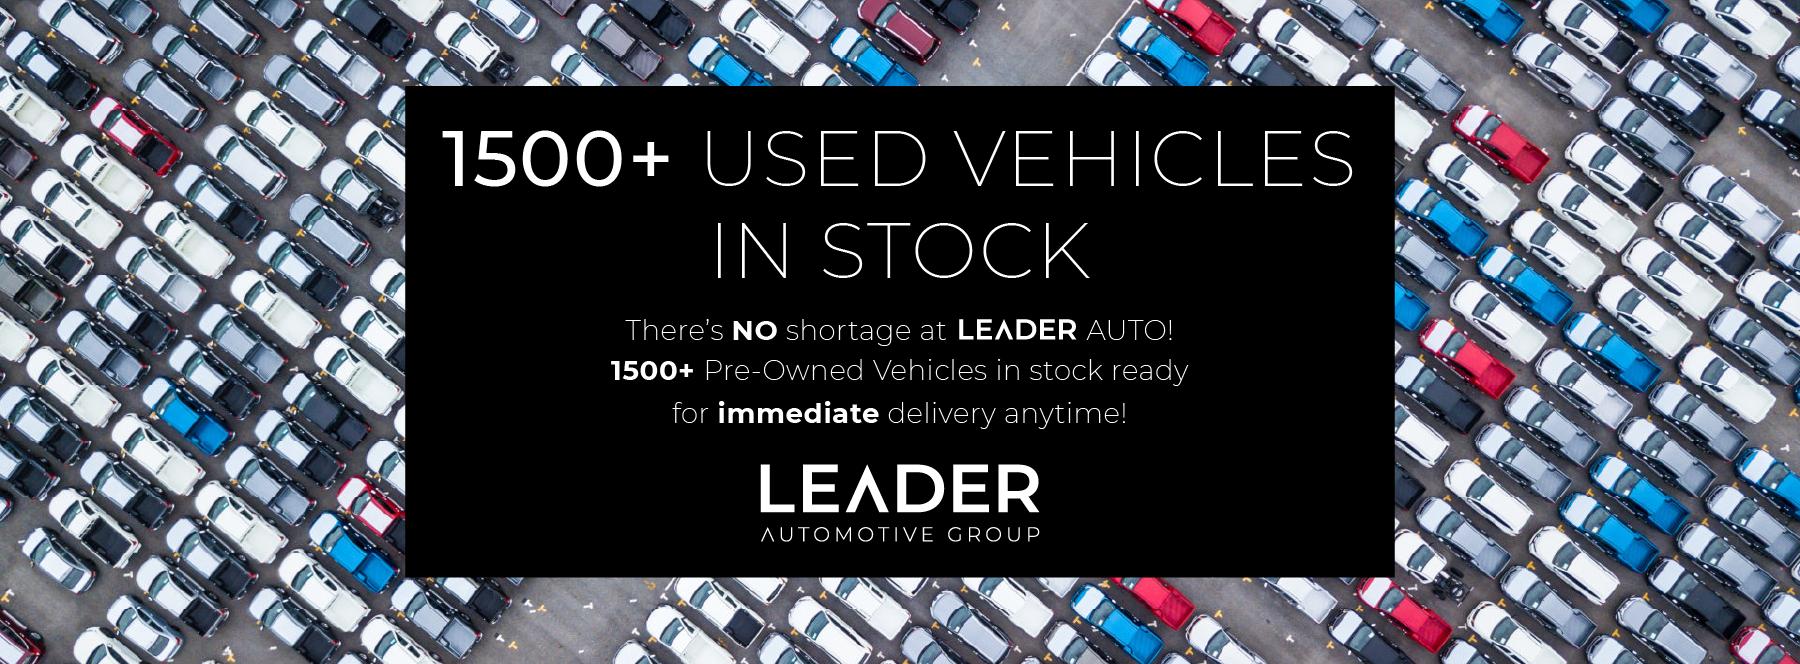 1500+ Used Cars Desktop NCH